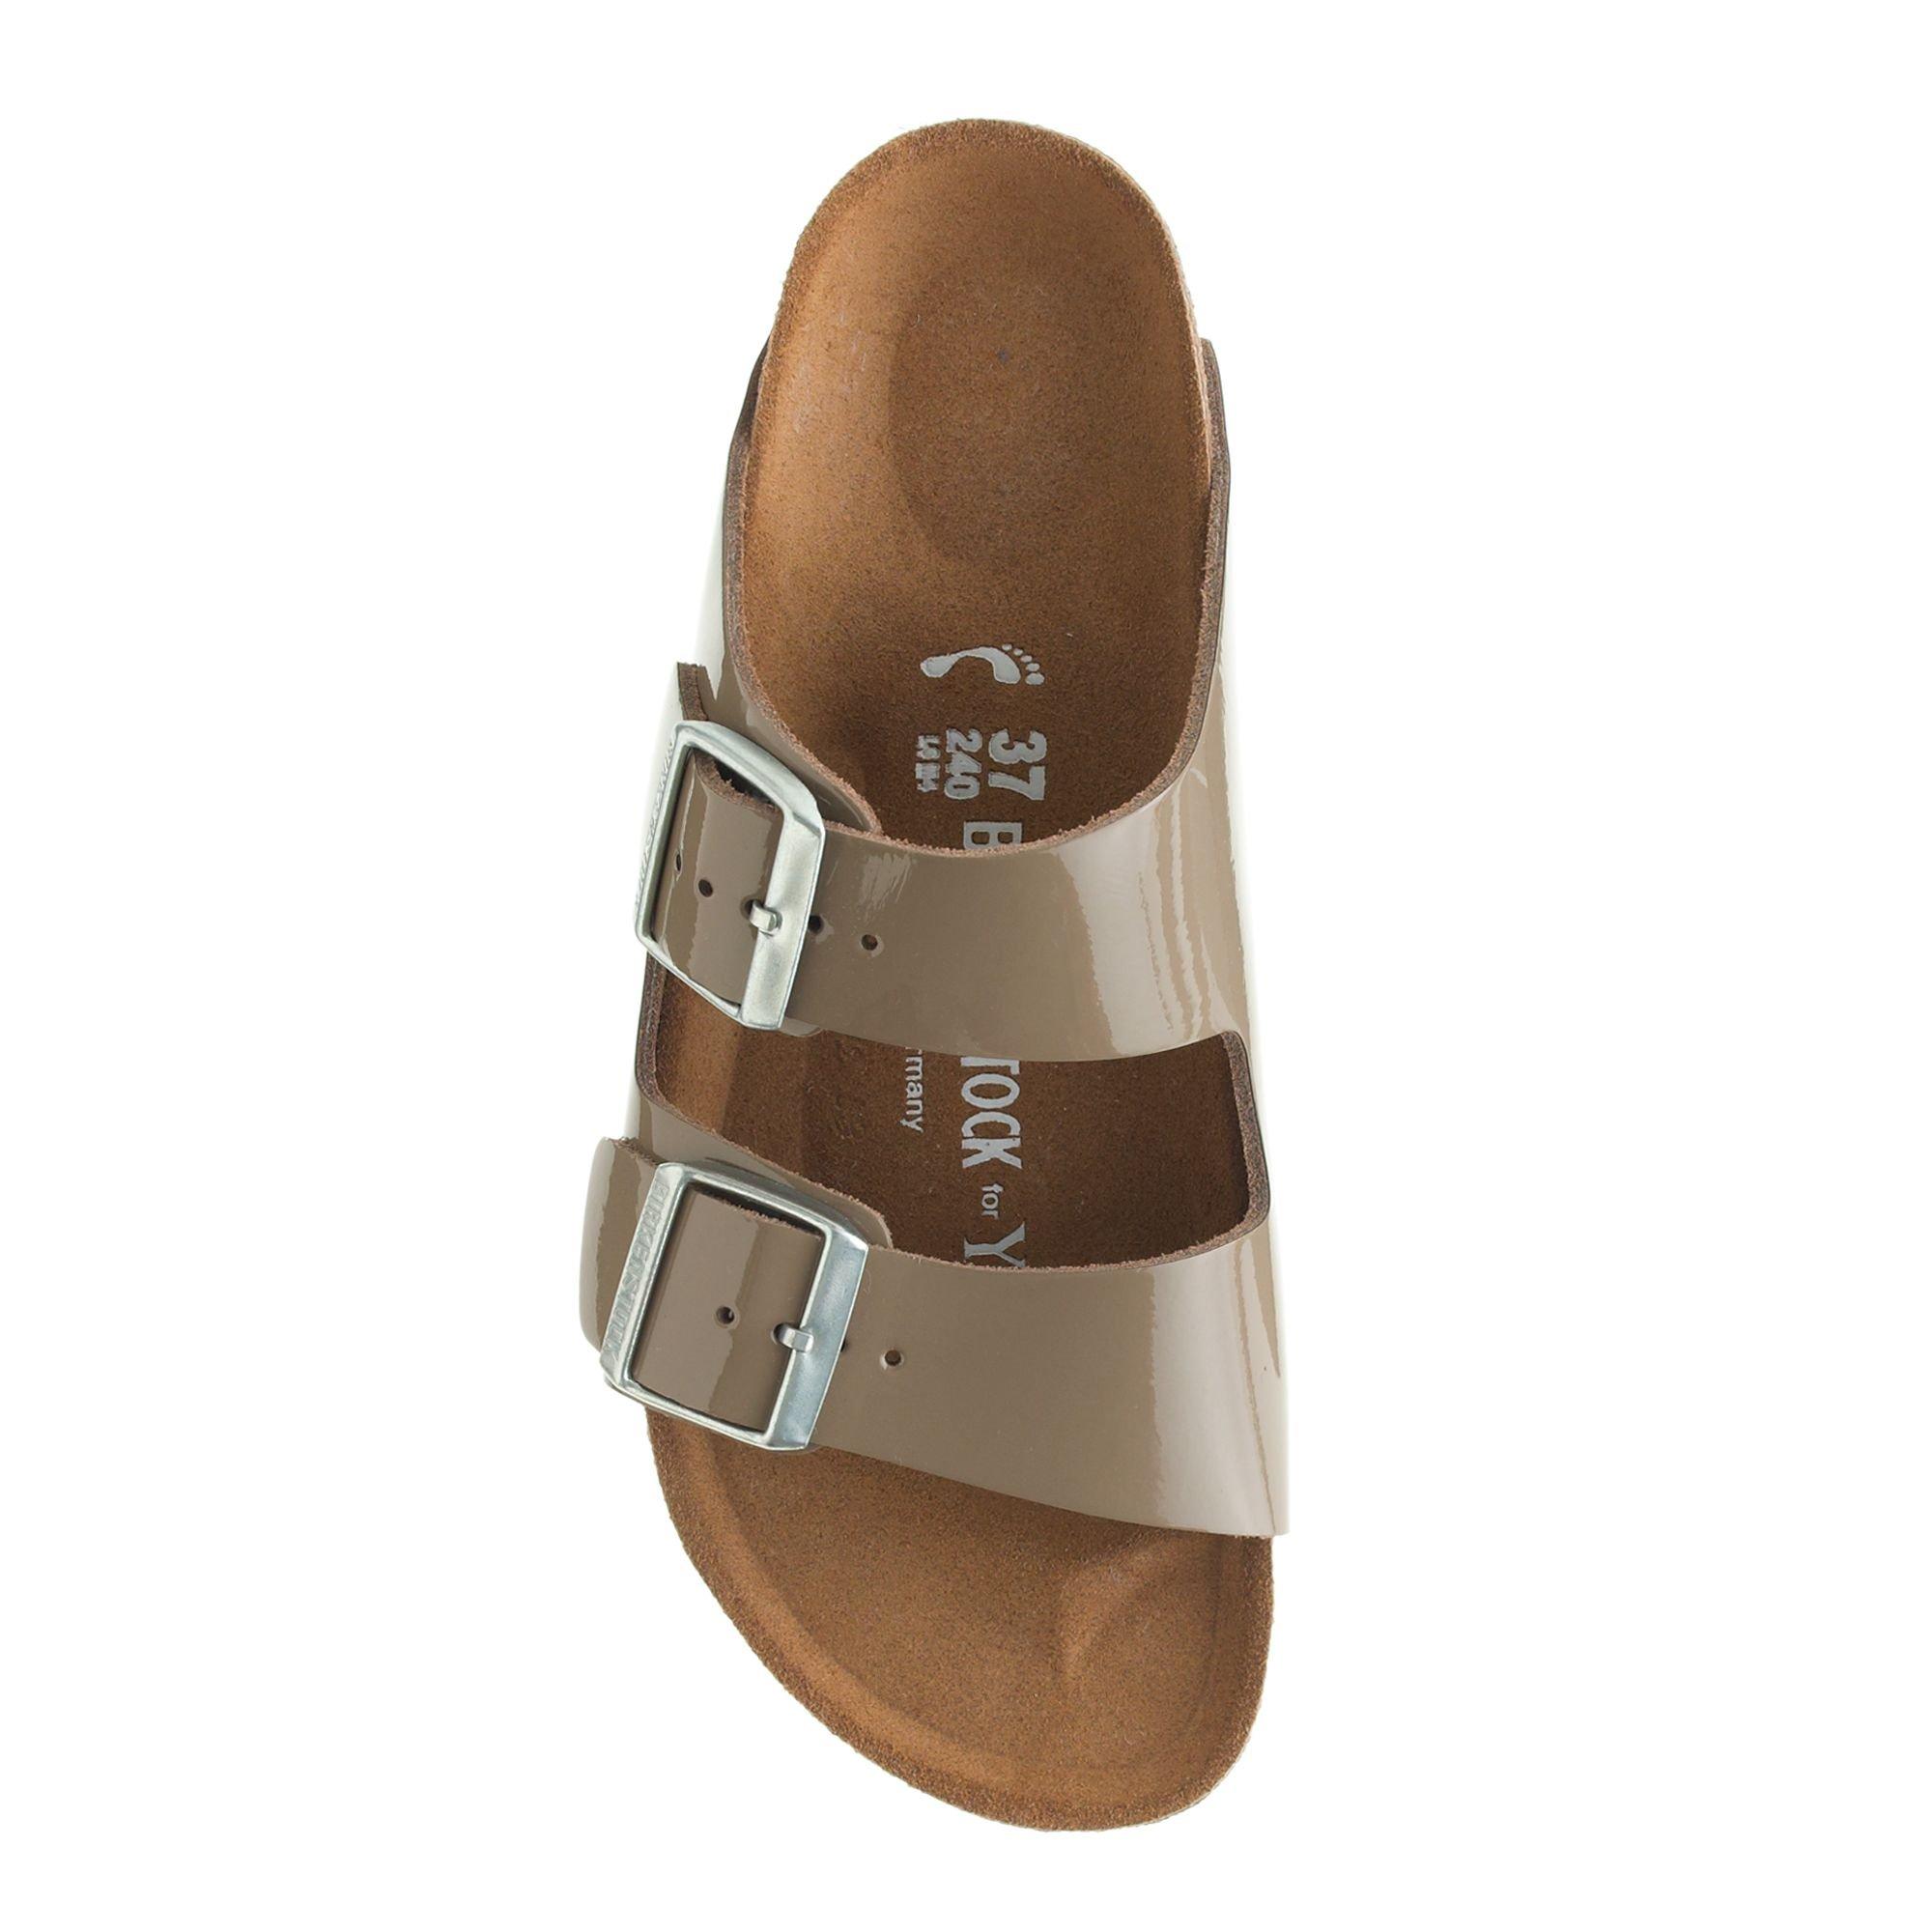 Lyst - Birkenstock Birkenstock For Patent Leather Arizona Sandals in ... 40cb36029